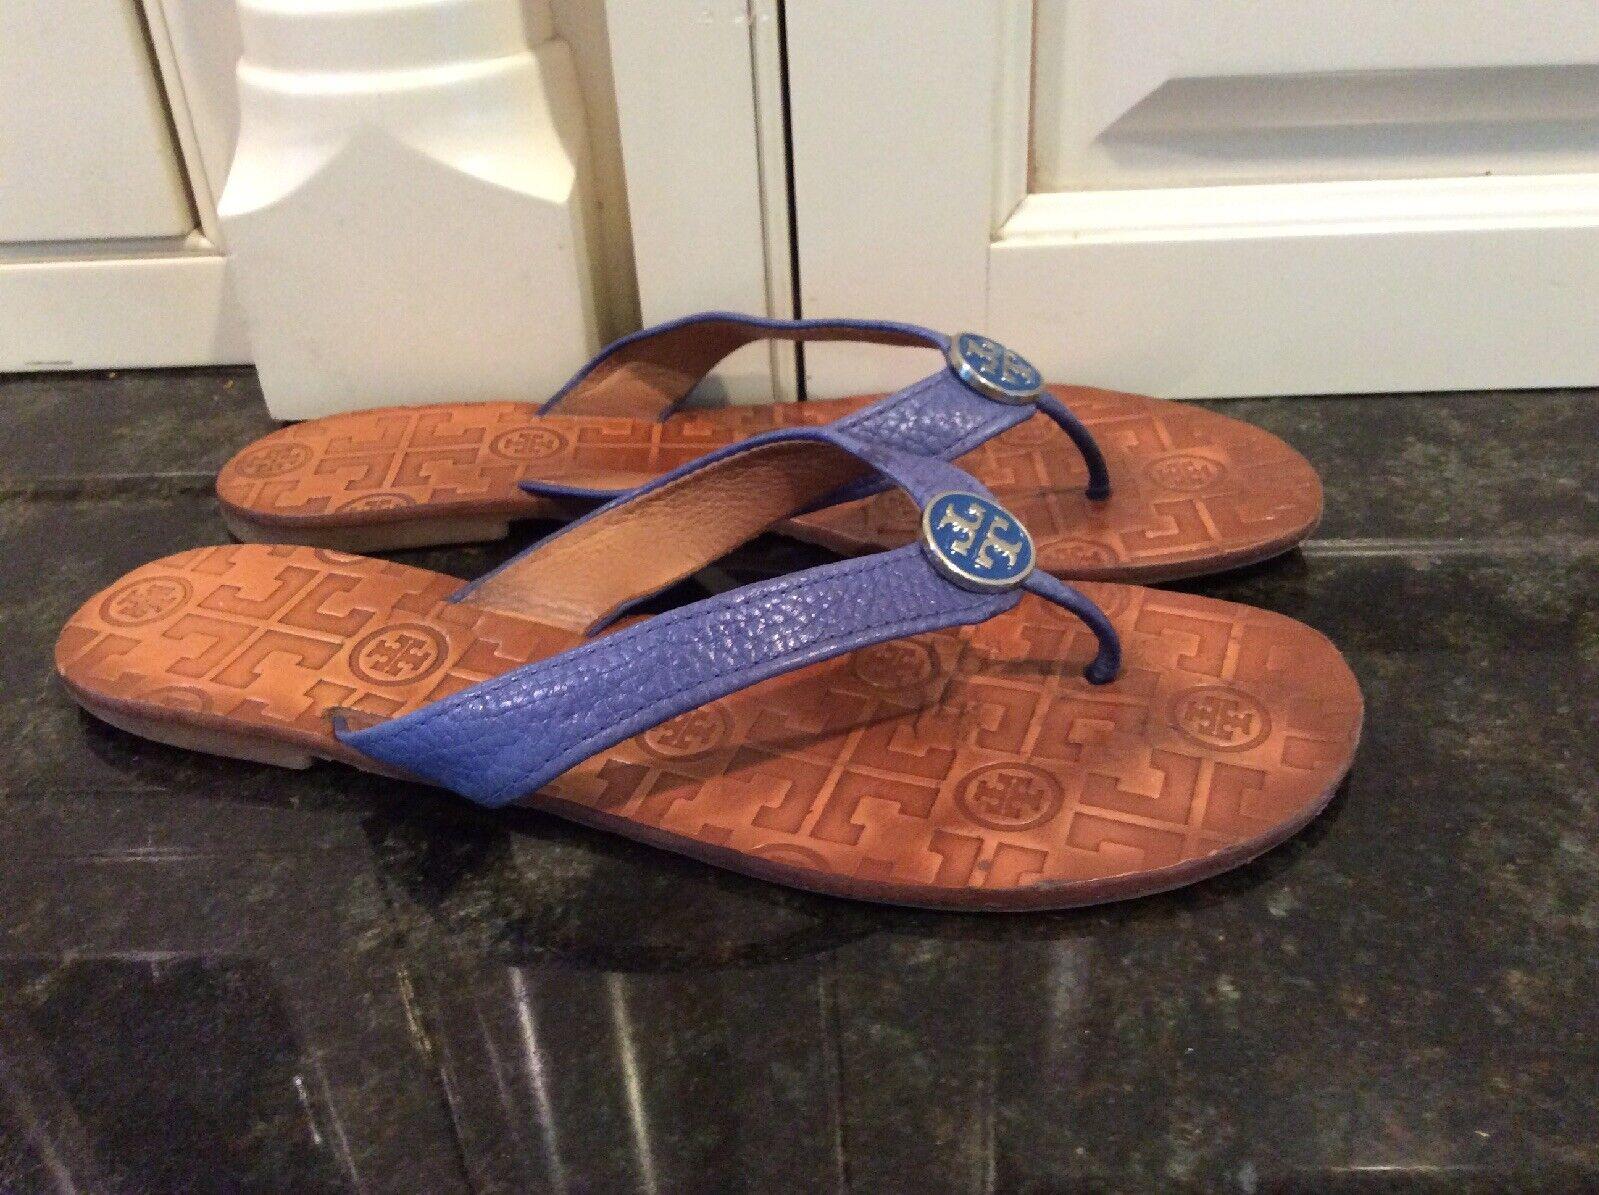 Tory Burch Periwinkle bluee Leather Flip Flops, Size 8 M. Nice